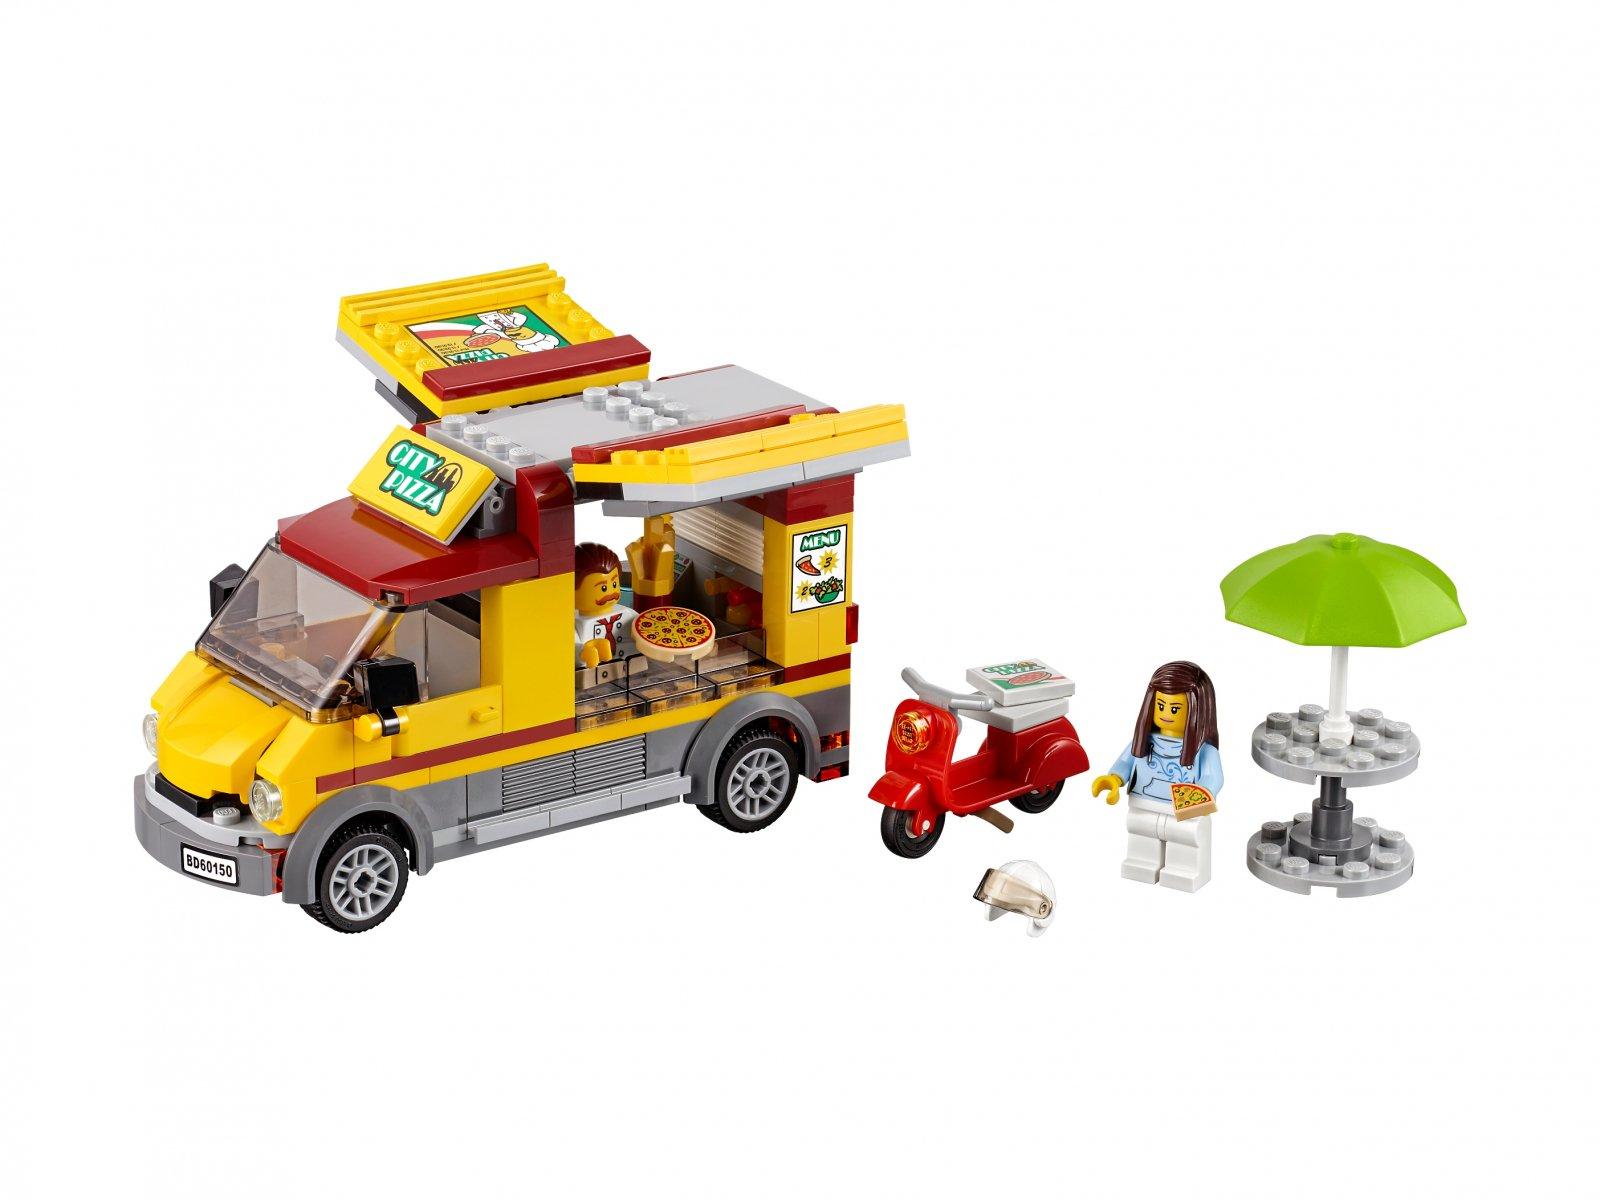 LEGO 60150 City Foodtruck z pizzą